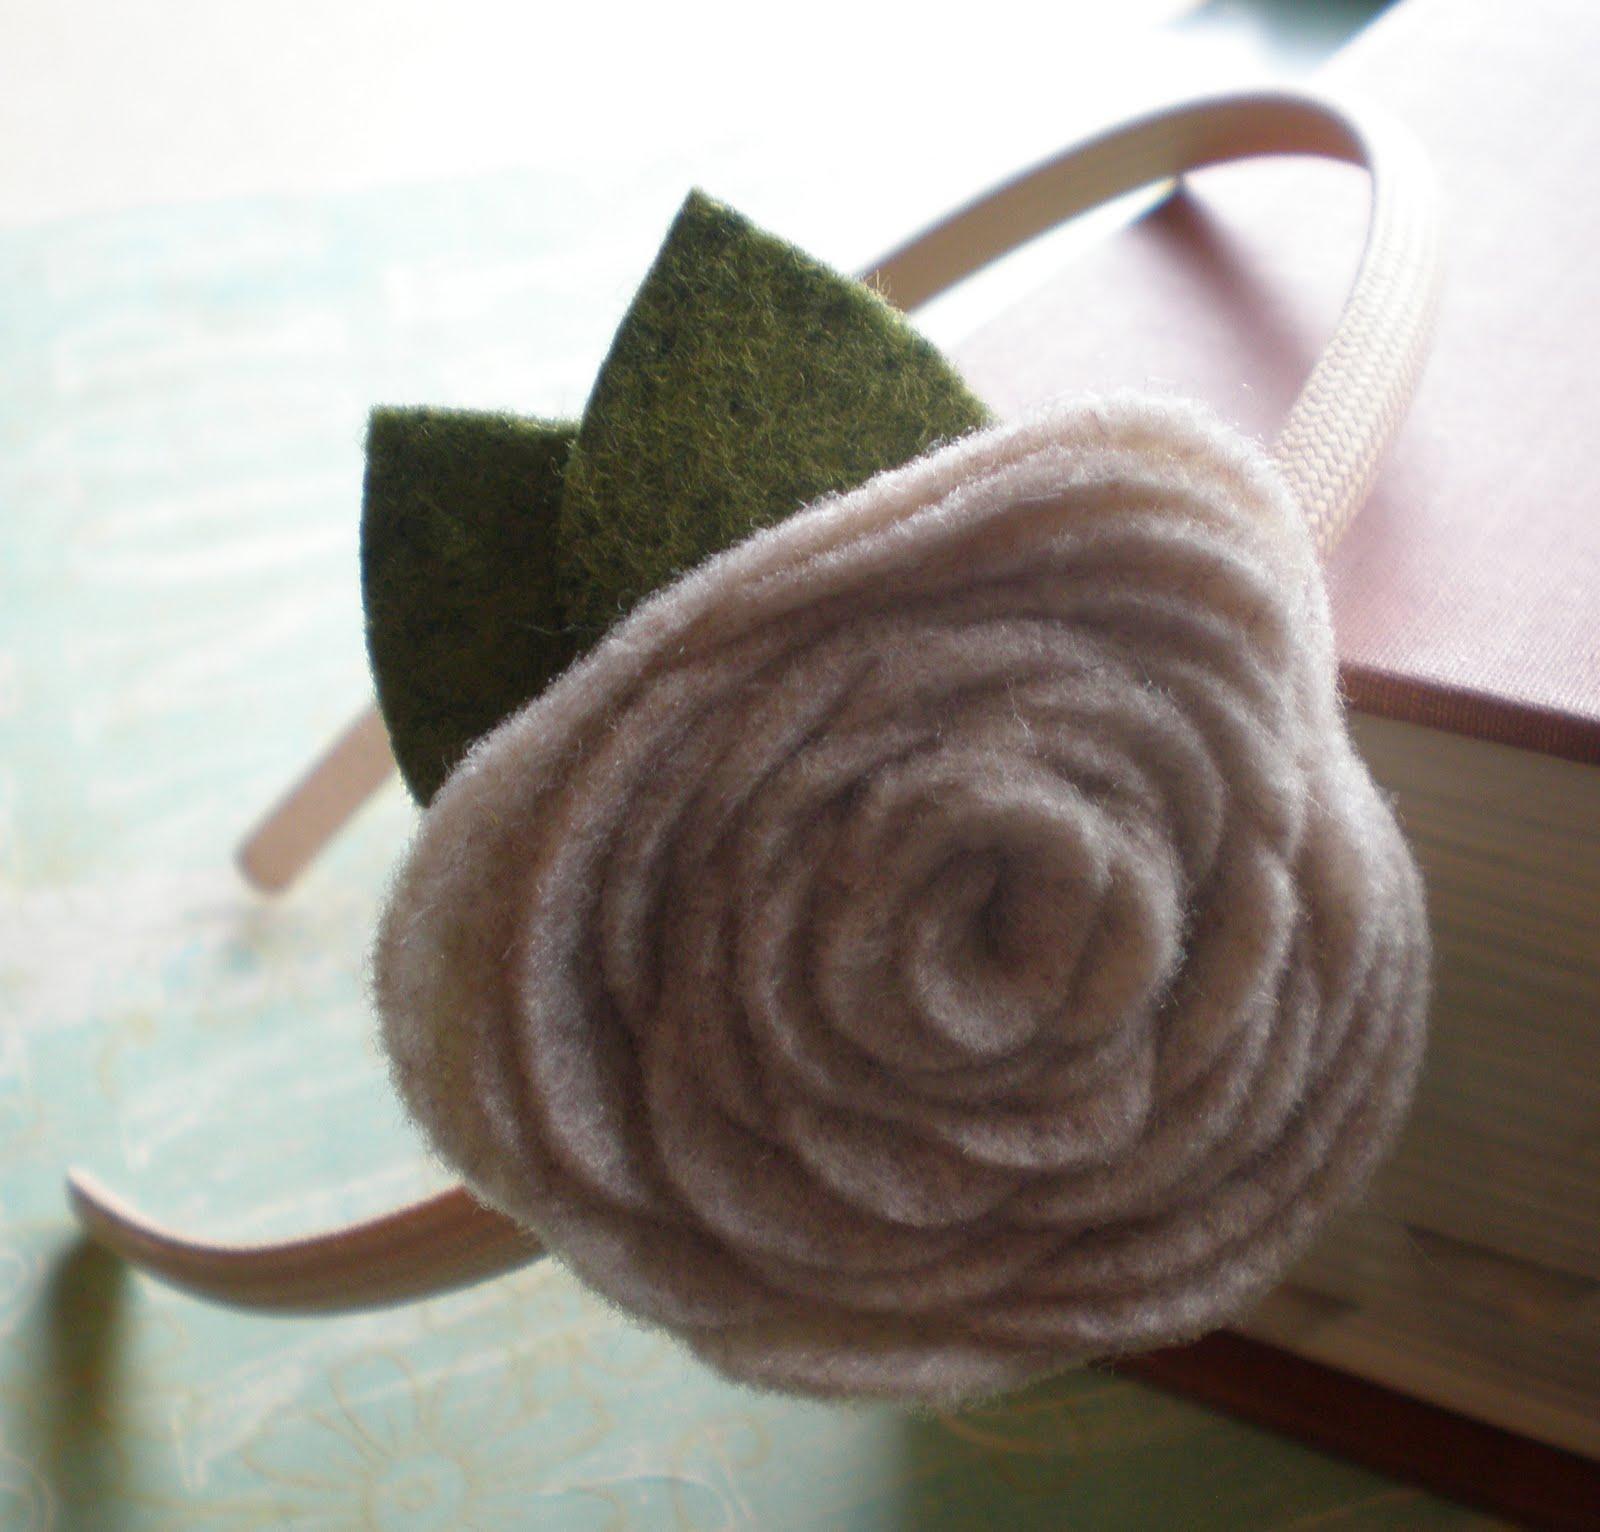 Flower Headband Tutorial: Baltimore Etsy Street Team: No Sew Felt Flower Headband